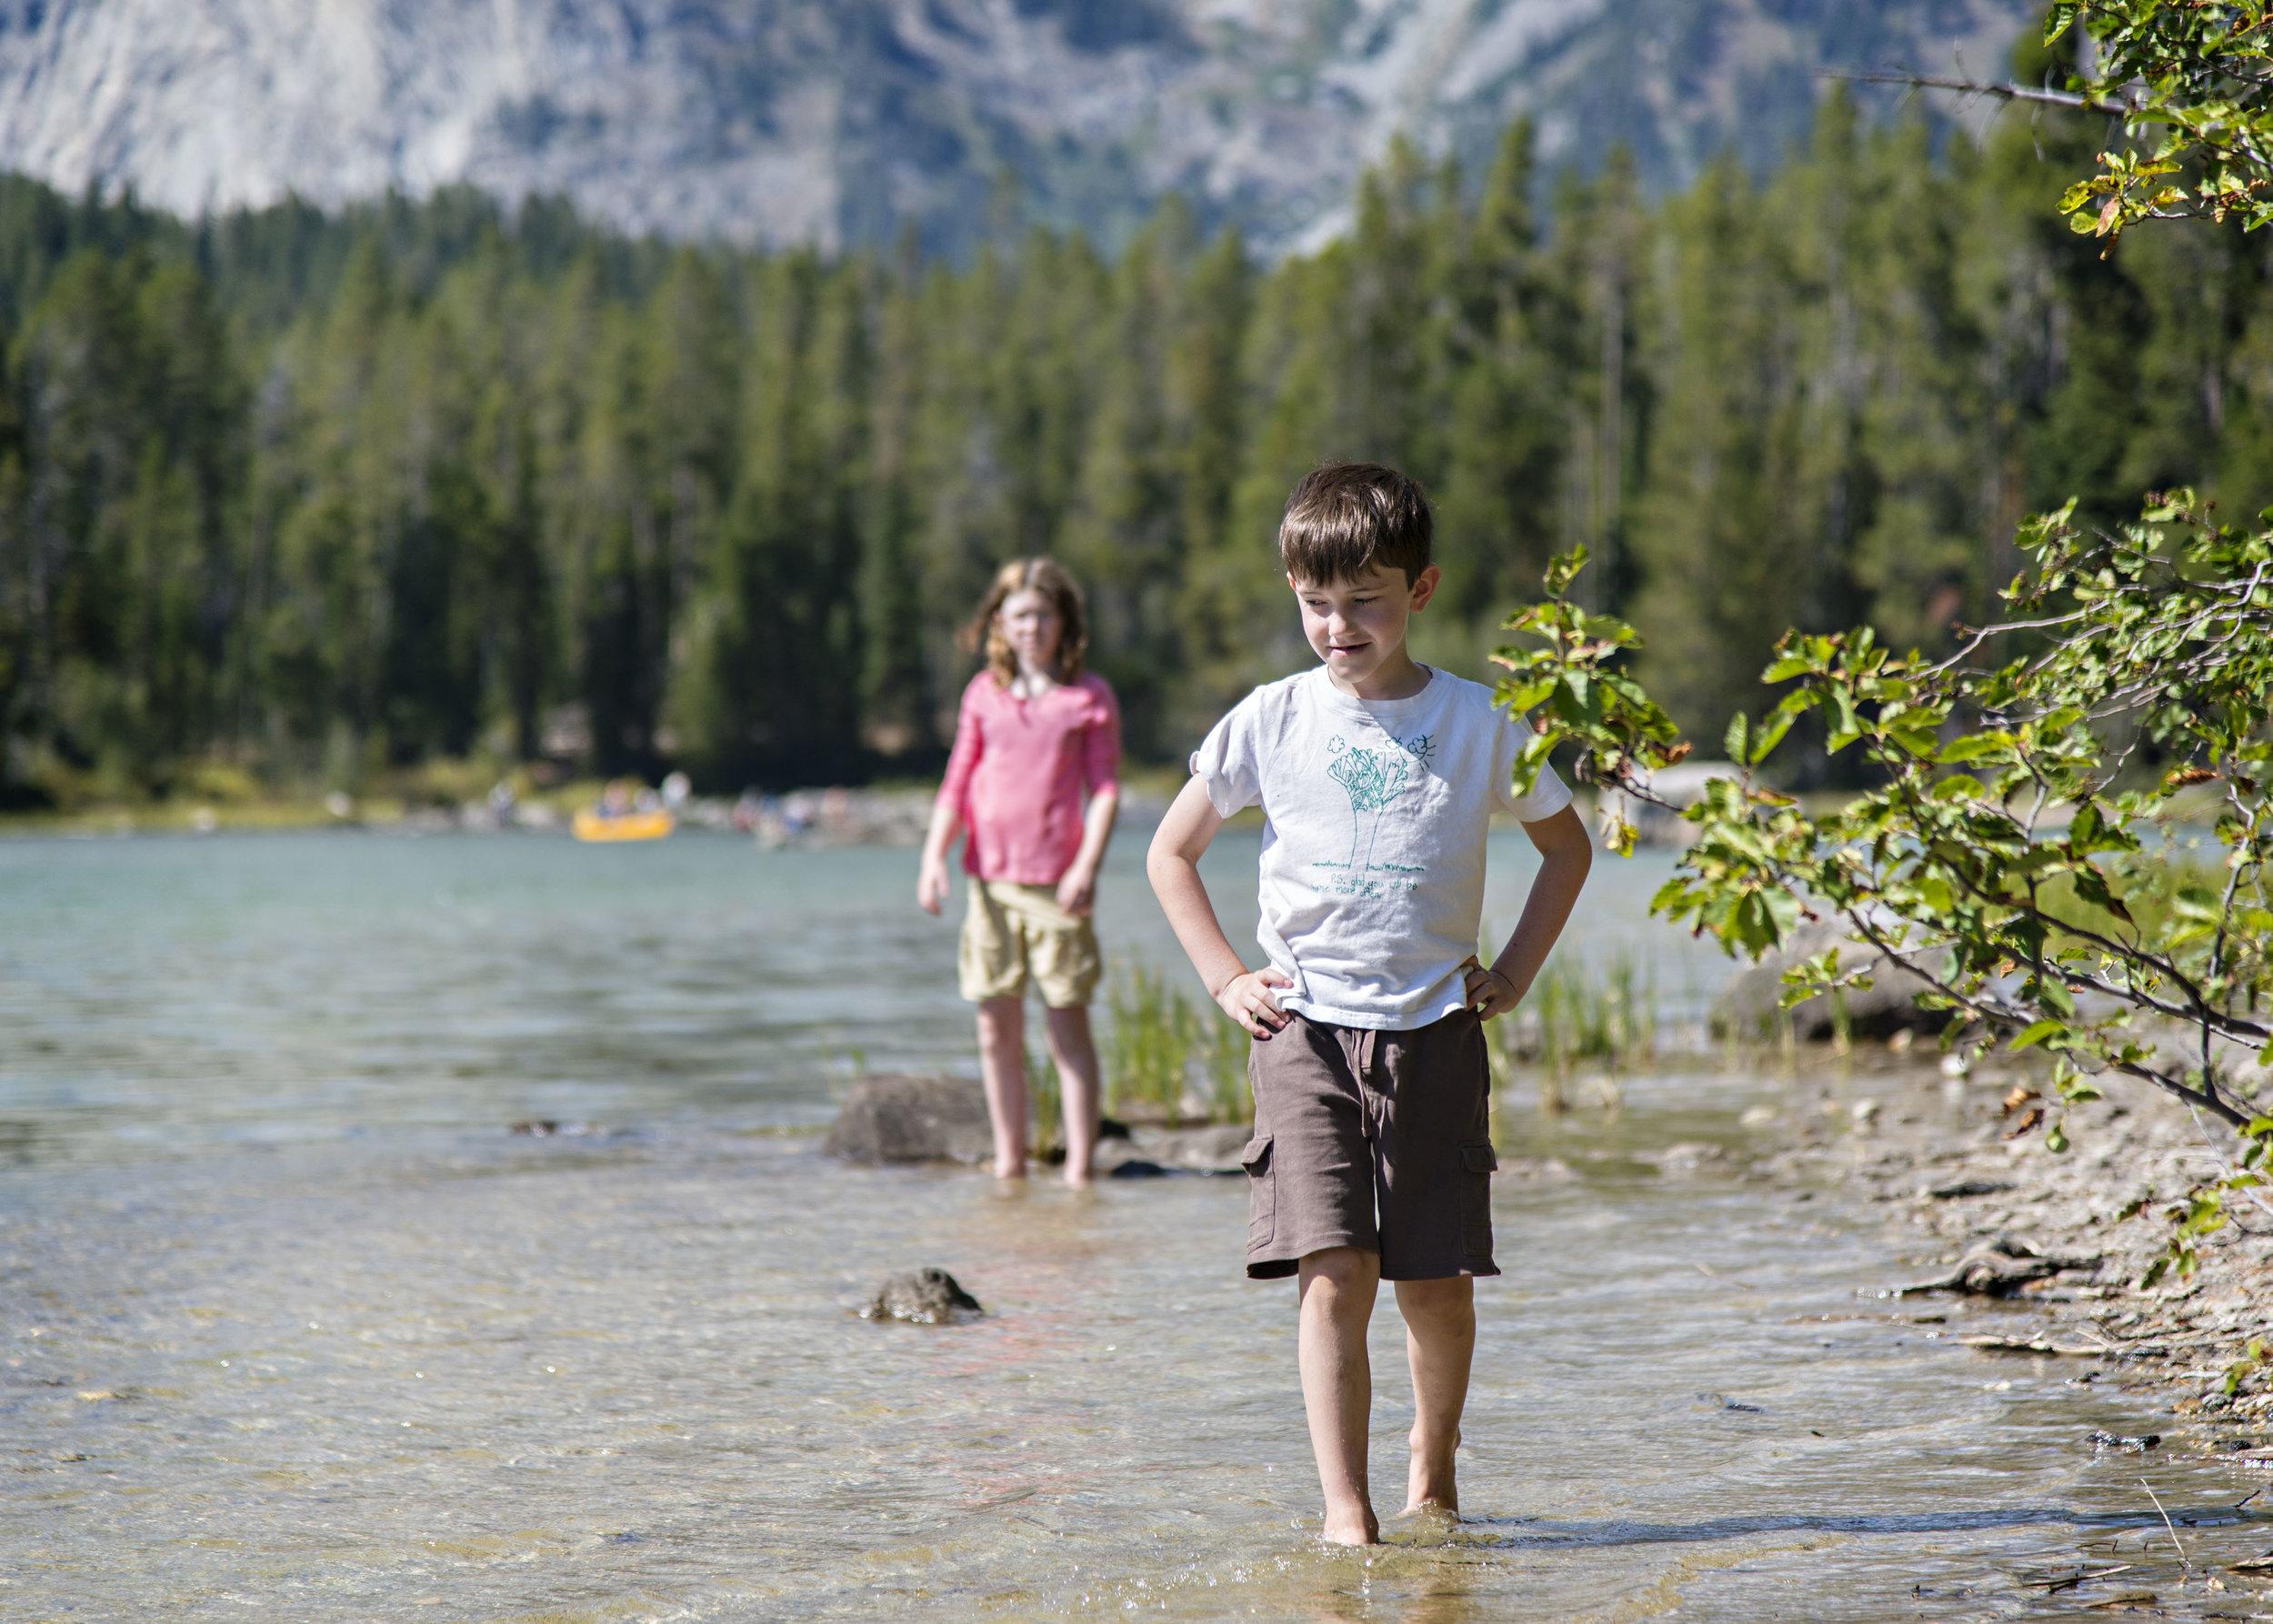 Parker and Samantha play in String Lake, Grand Teton National Park. Nikon D800, Nikkor 24-120mm lens @ 120mm, ISO 200, f4, 1/600 sec.